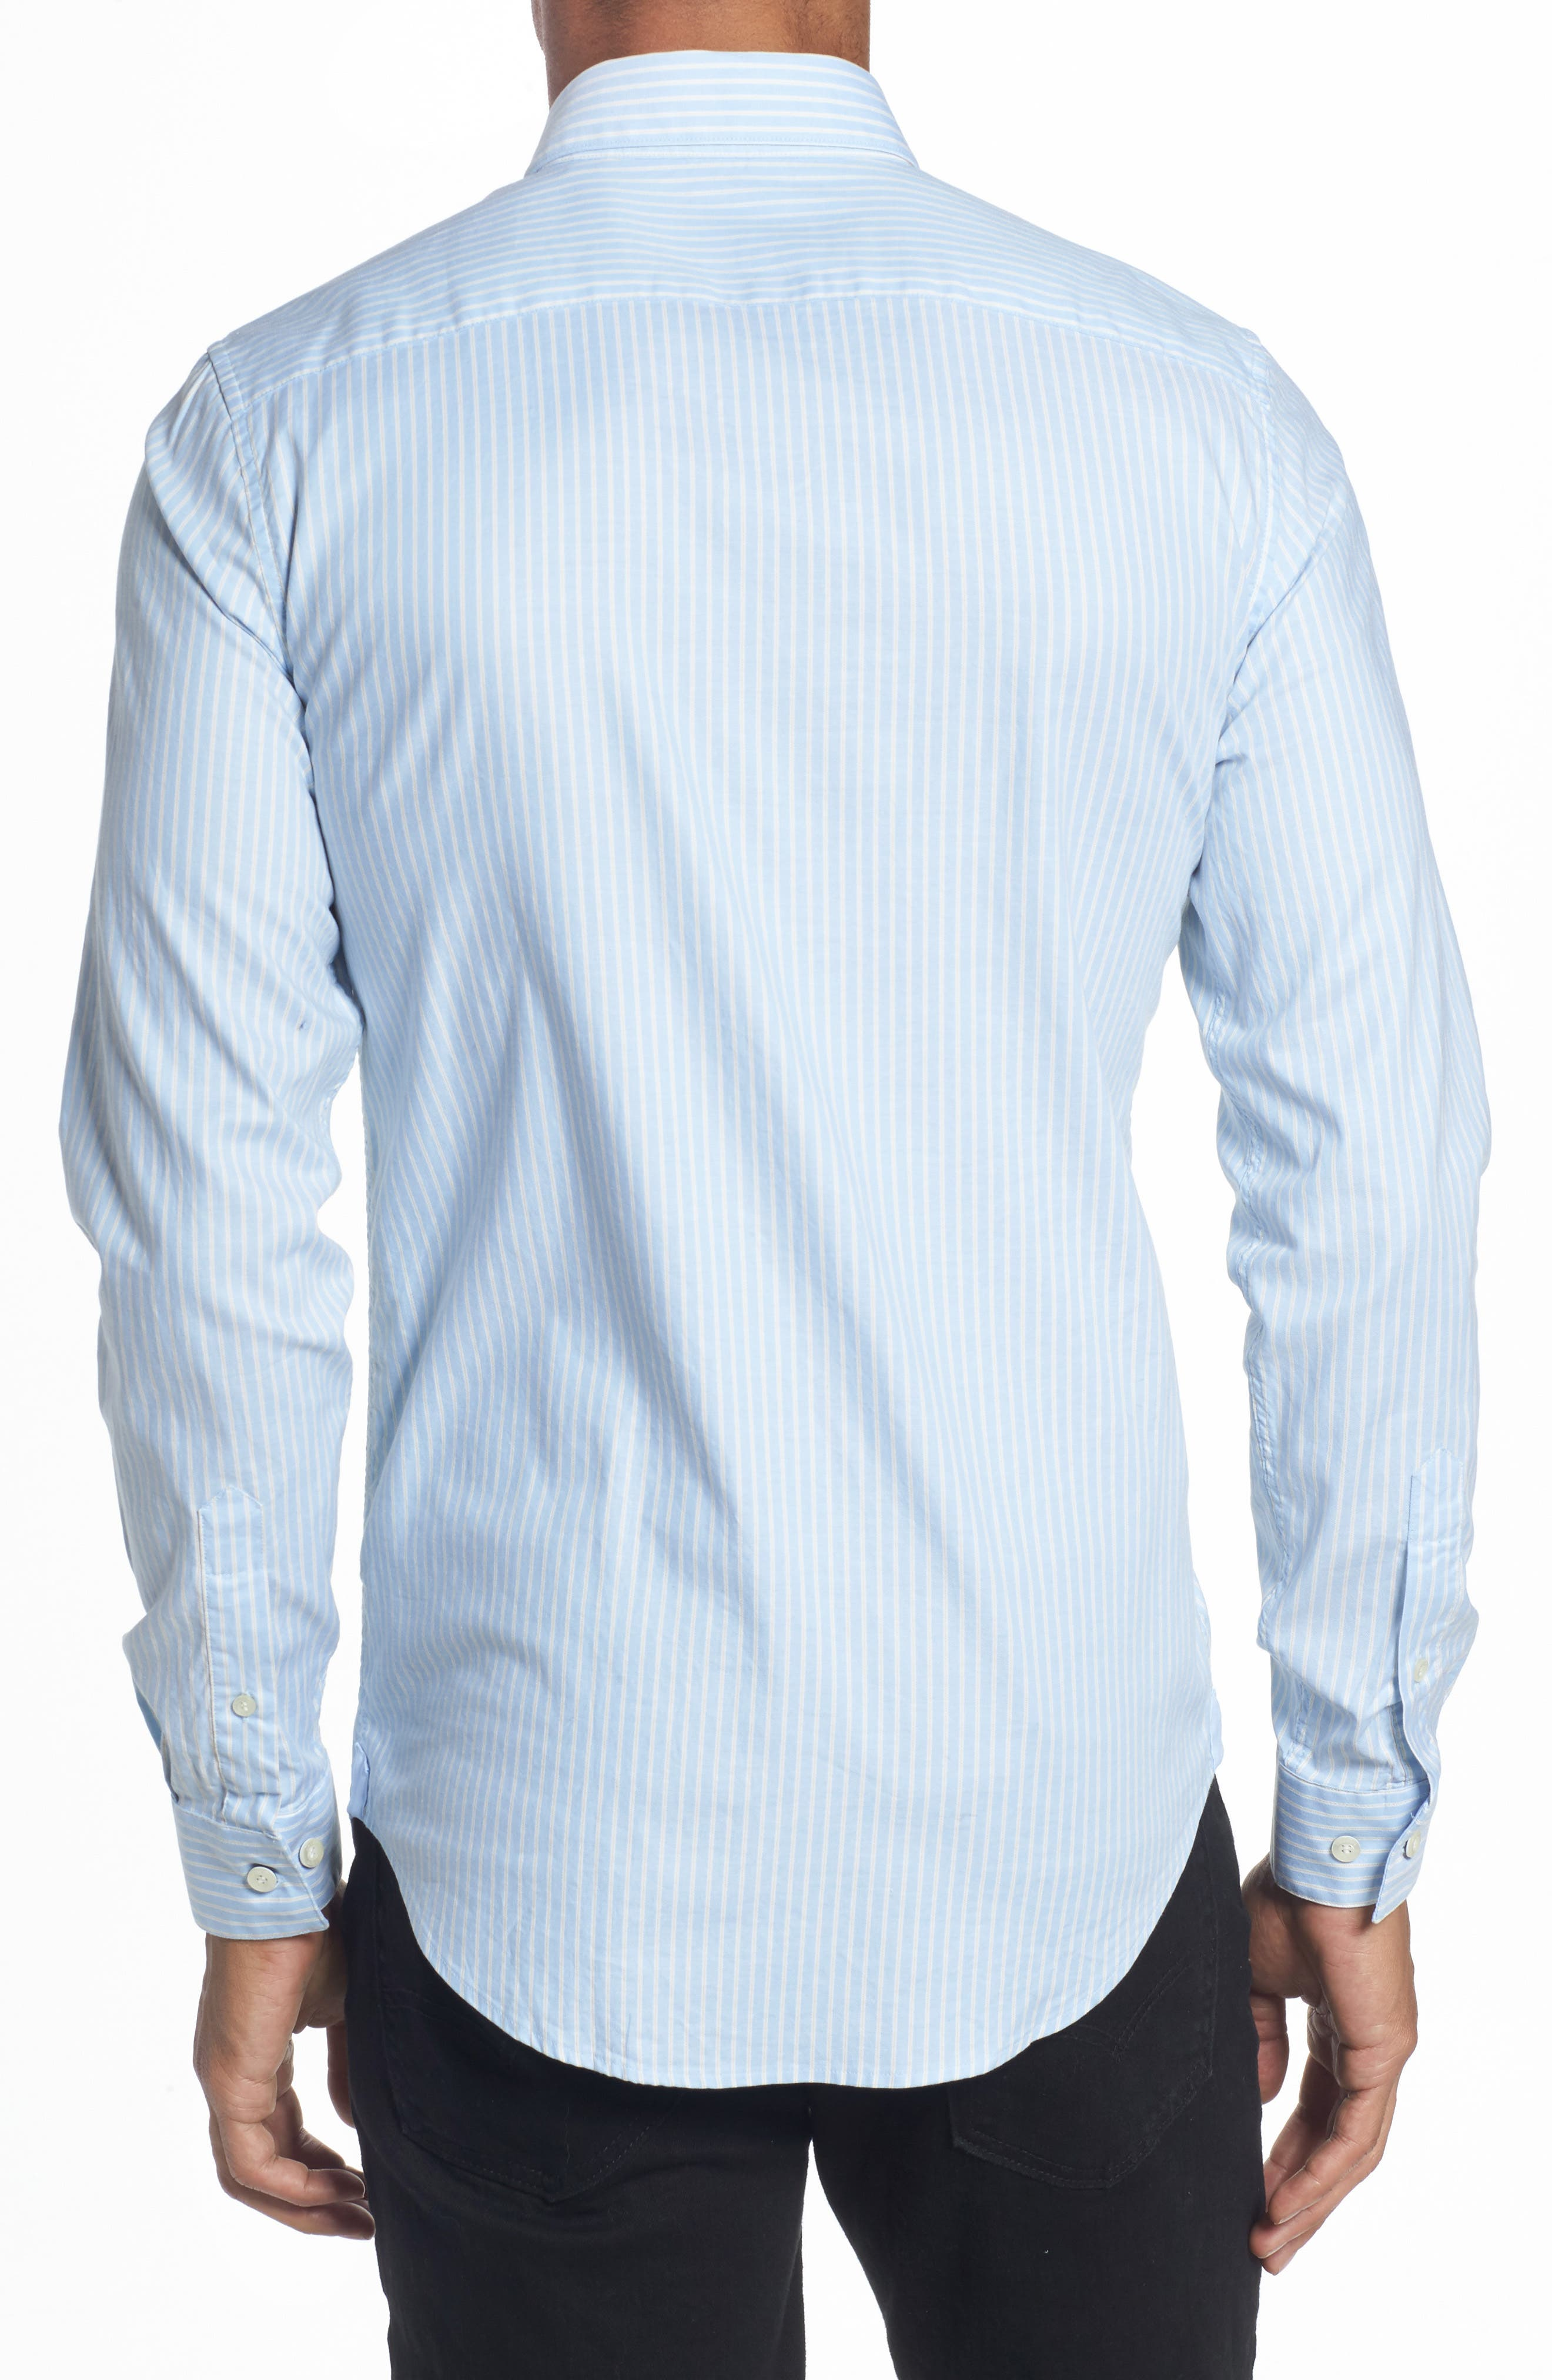 LACOSTE,                             Slim Fit Stripe Shirt,                             Alternate thumbnail 2, color,                             436